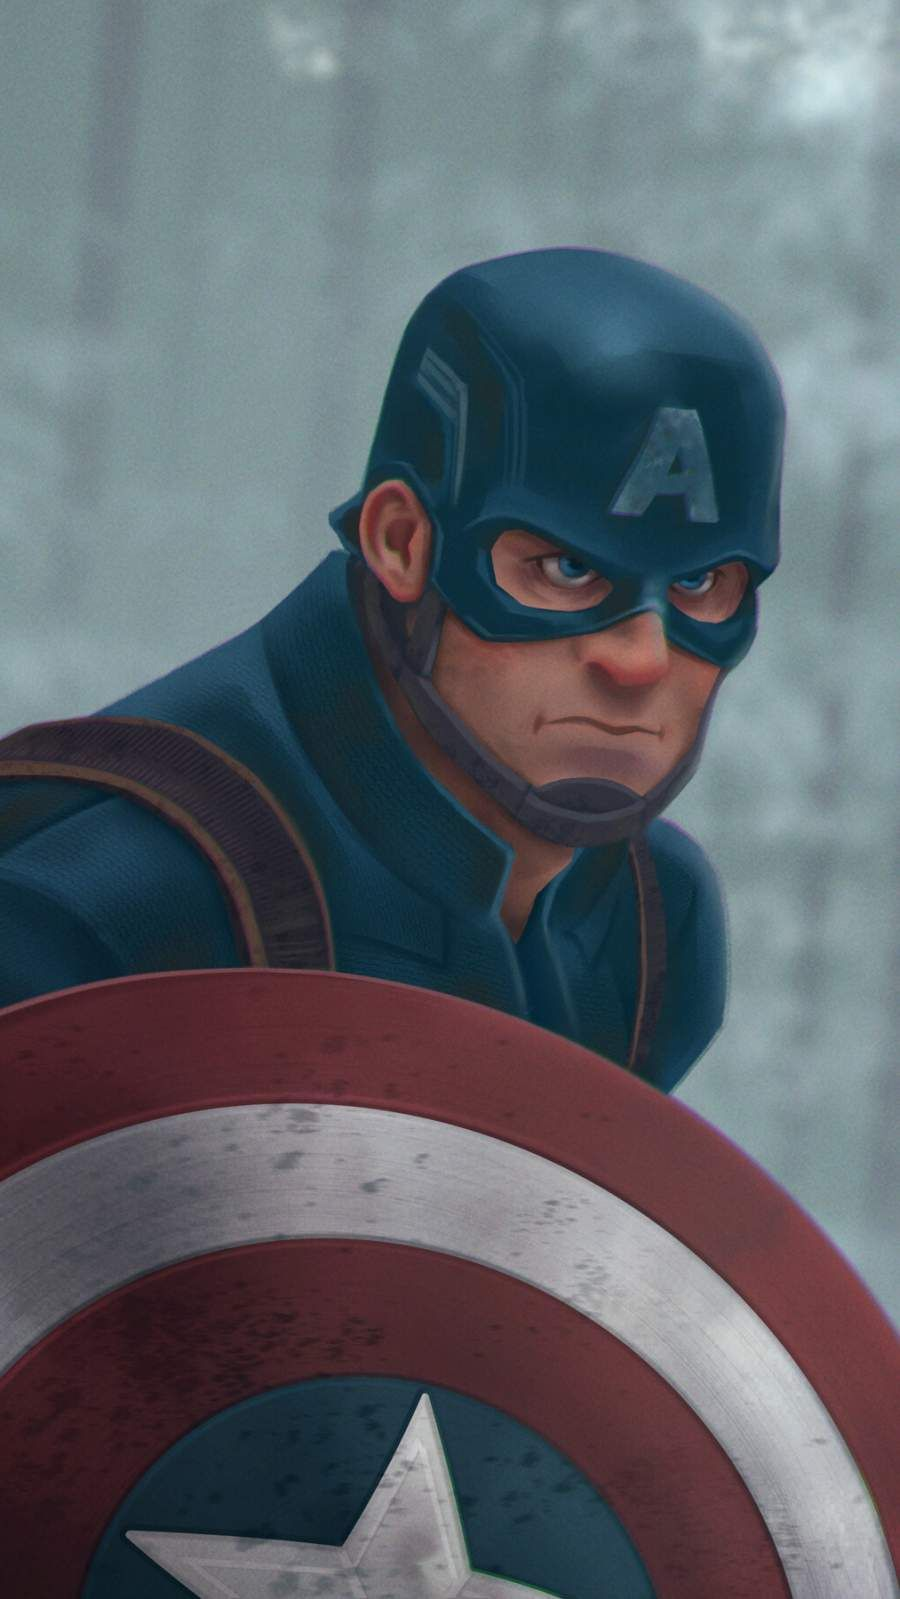 Captain America Iphone Wallpaper Iphone Wallpaper Marvel Art Captain America